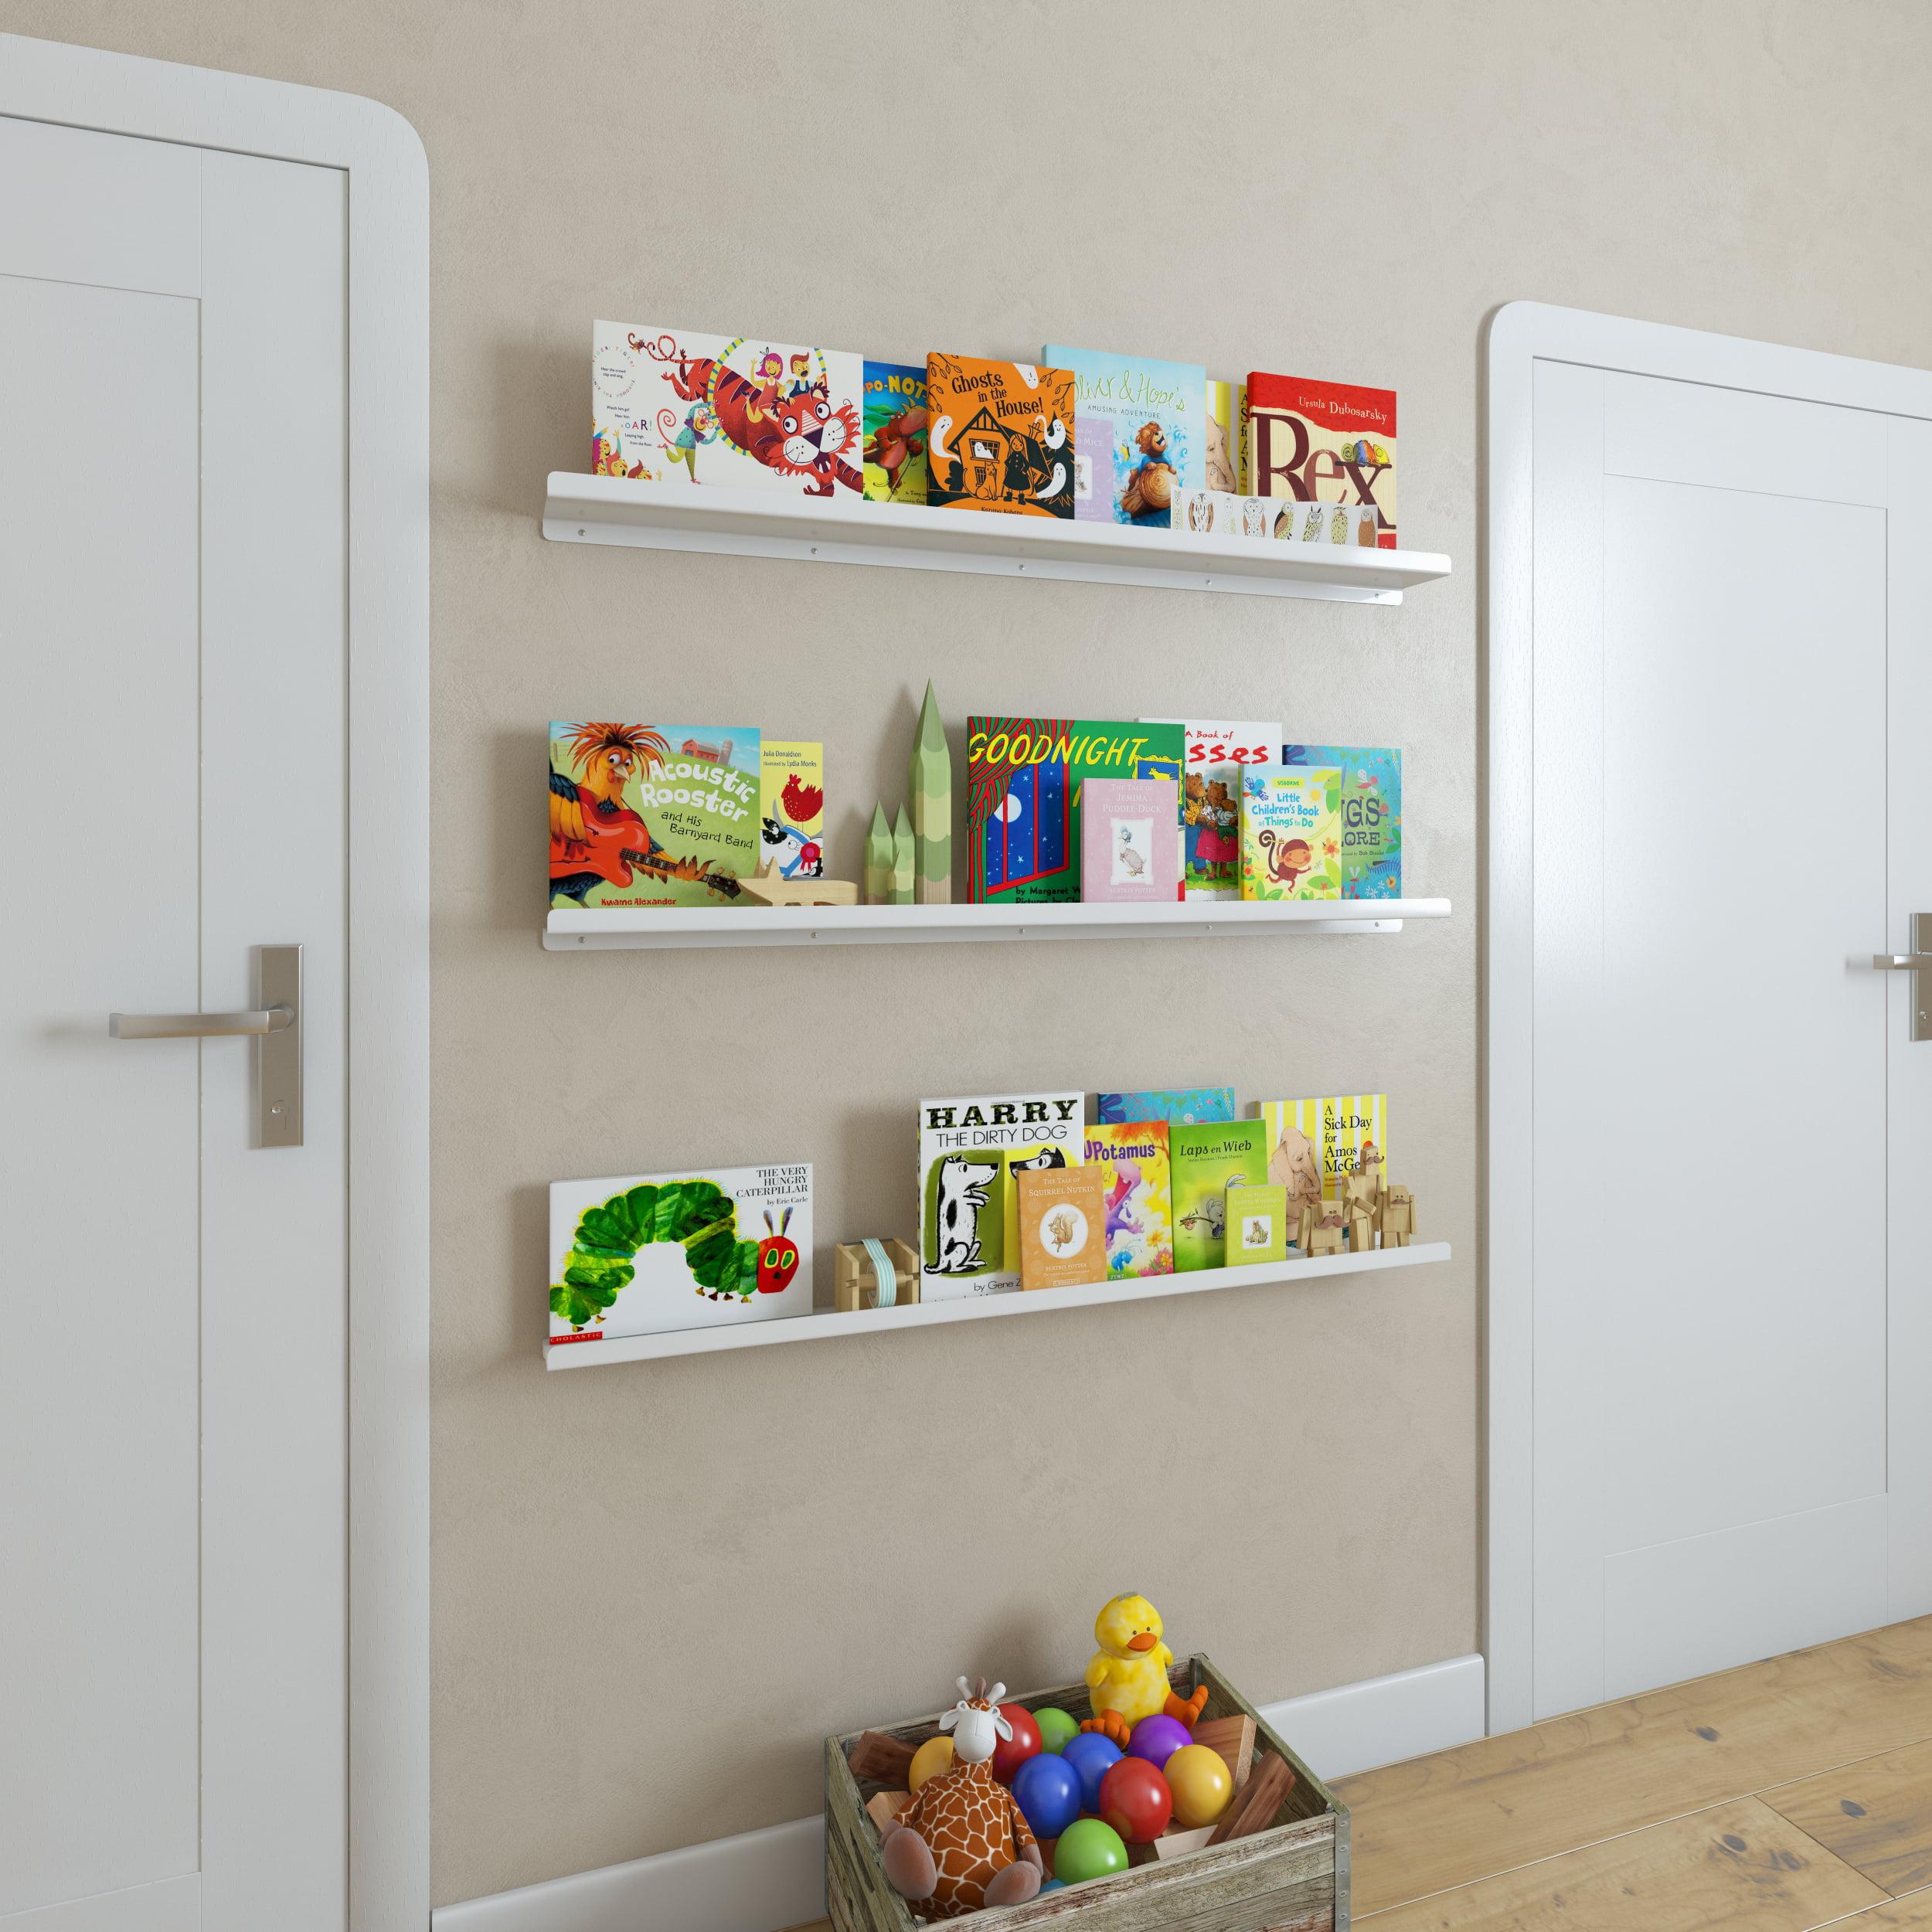 Wallniture Metallo 46'' Floating Shelves for Kids Room Decor and